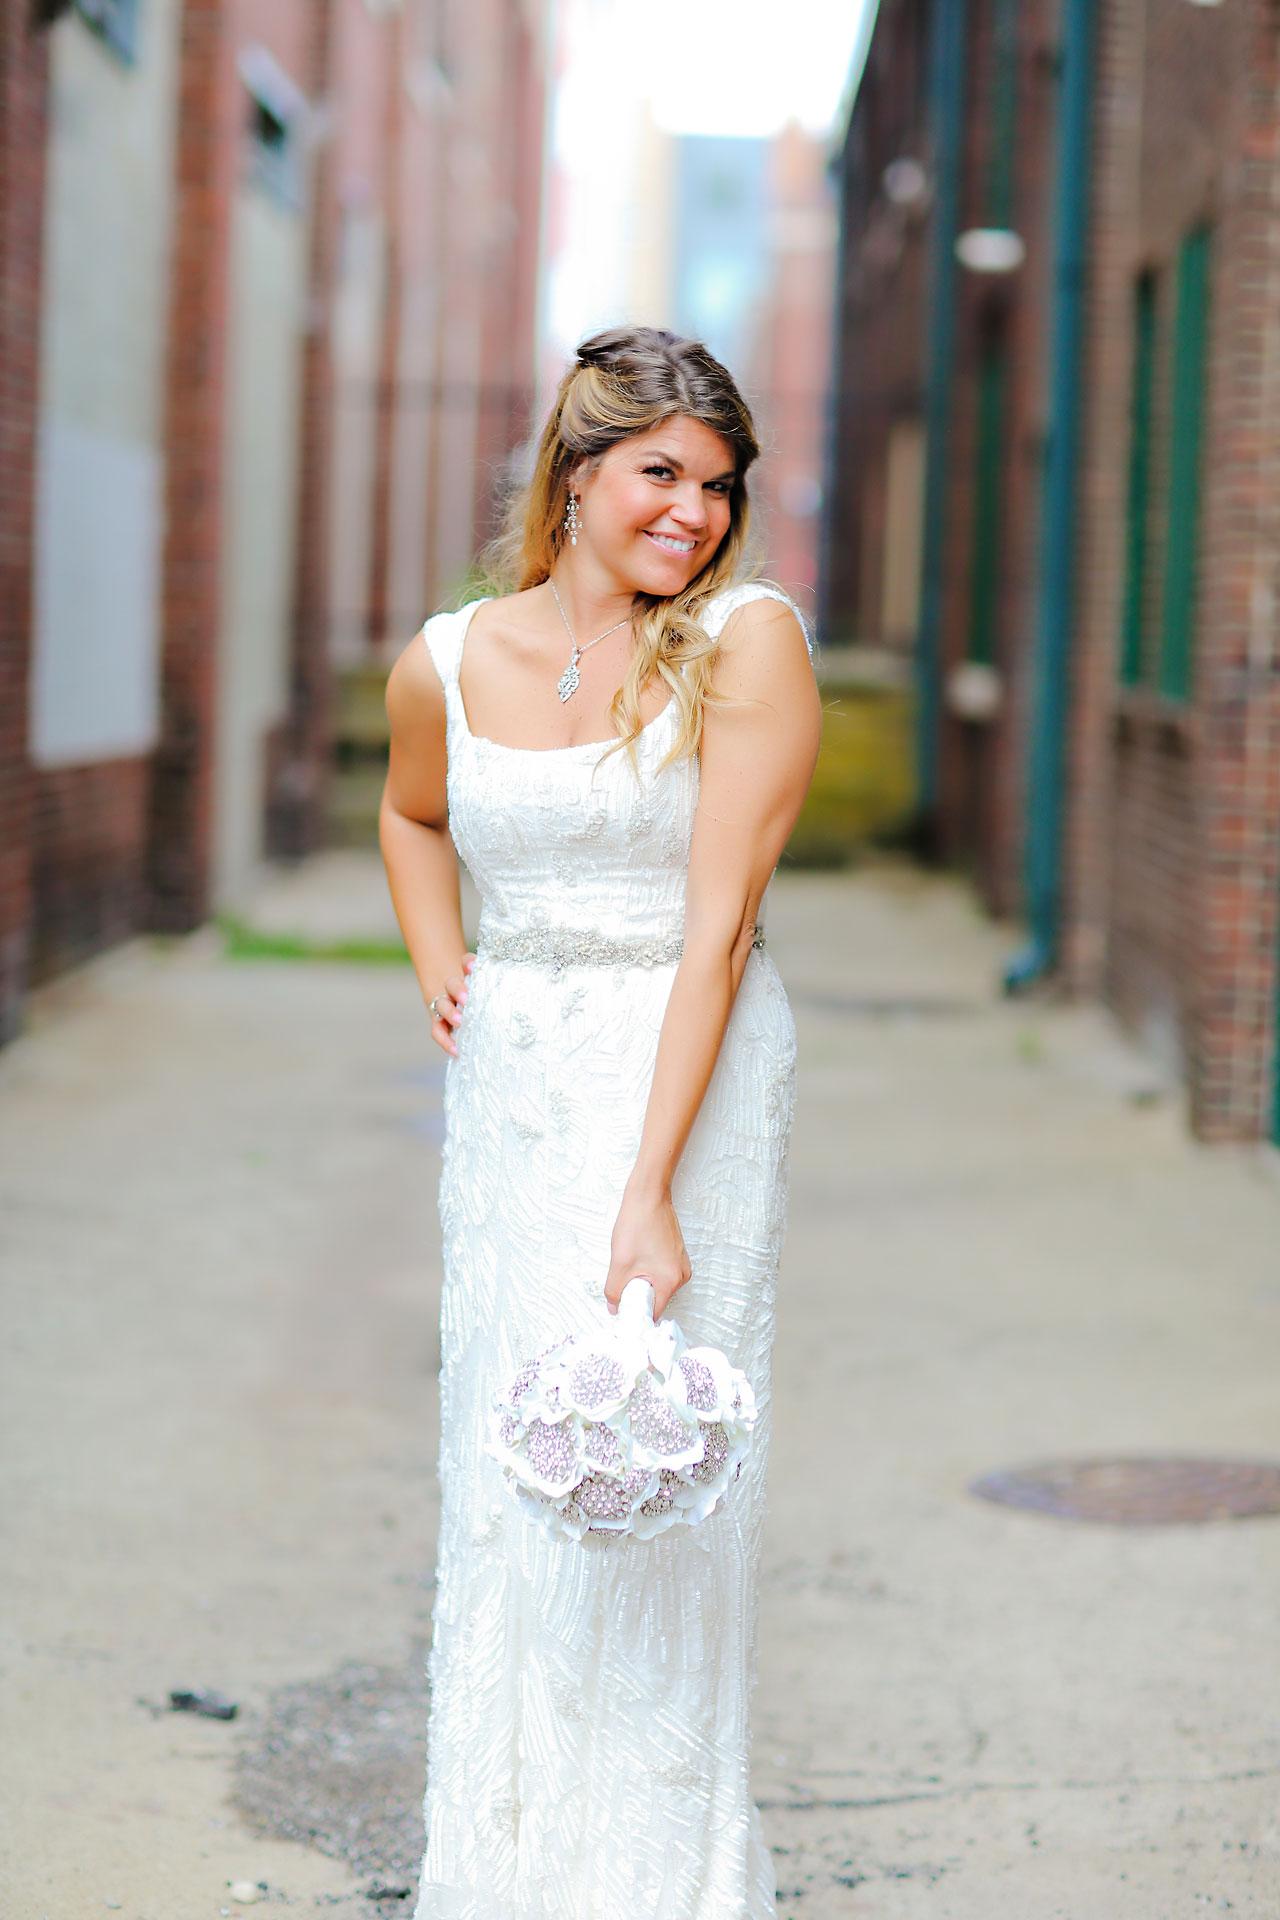 Amy Nick Canal 337 Wedding 103